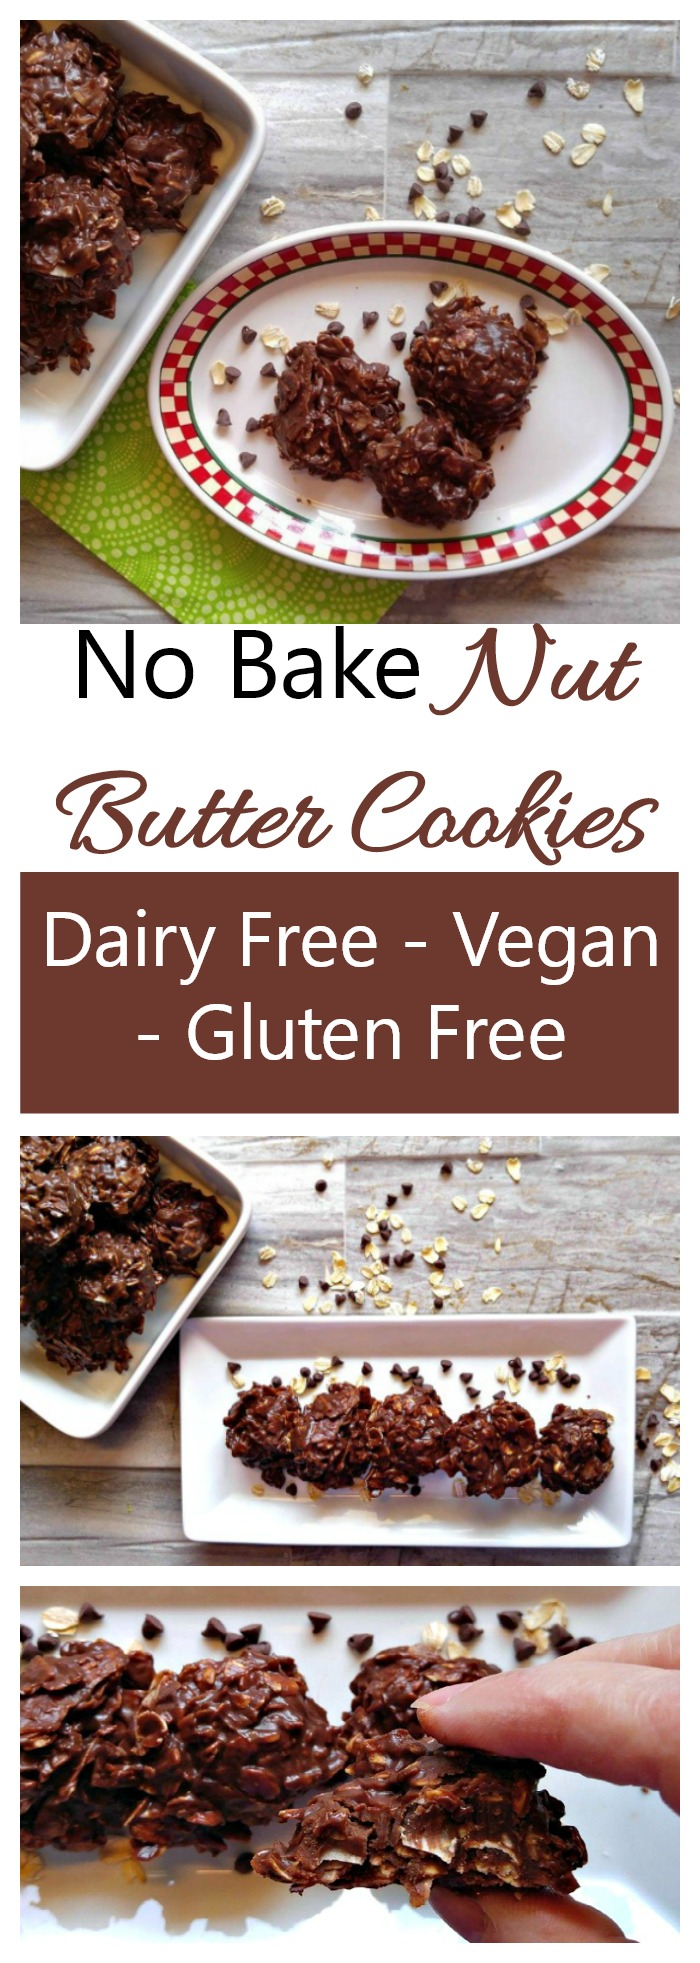 No Bake Nut Butter Cookies - Vegan - Gluten Free